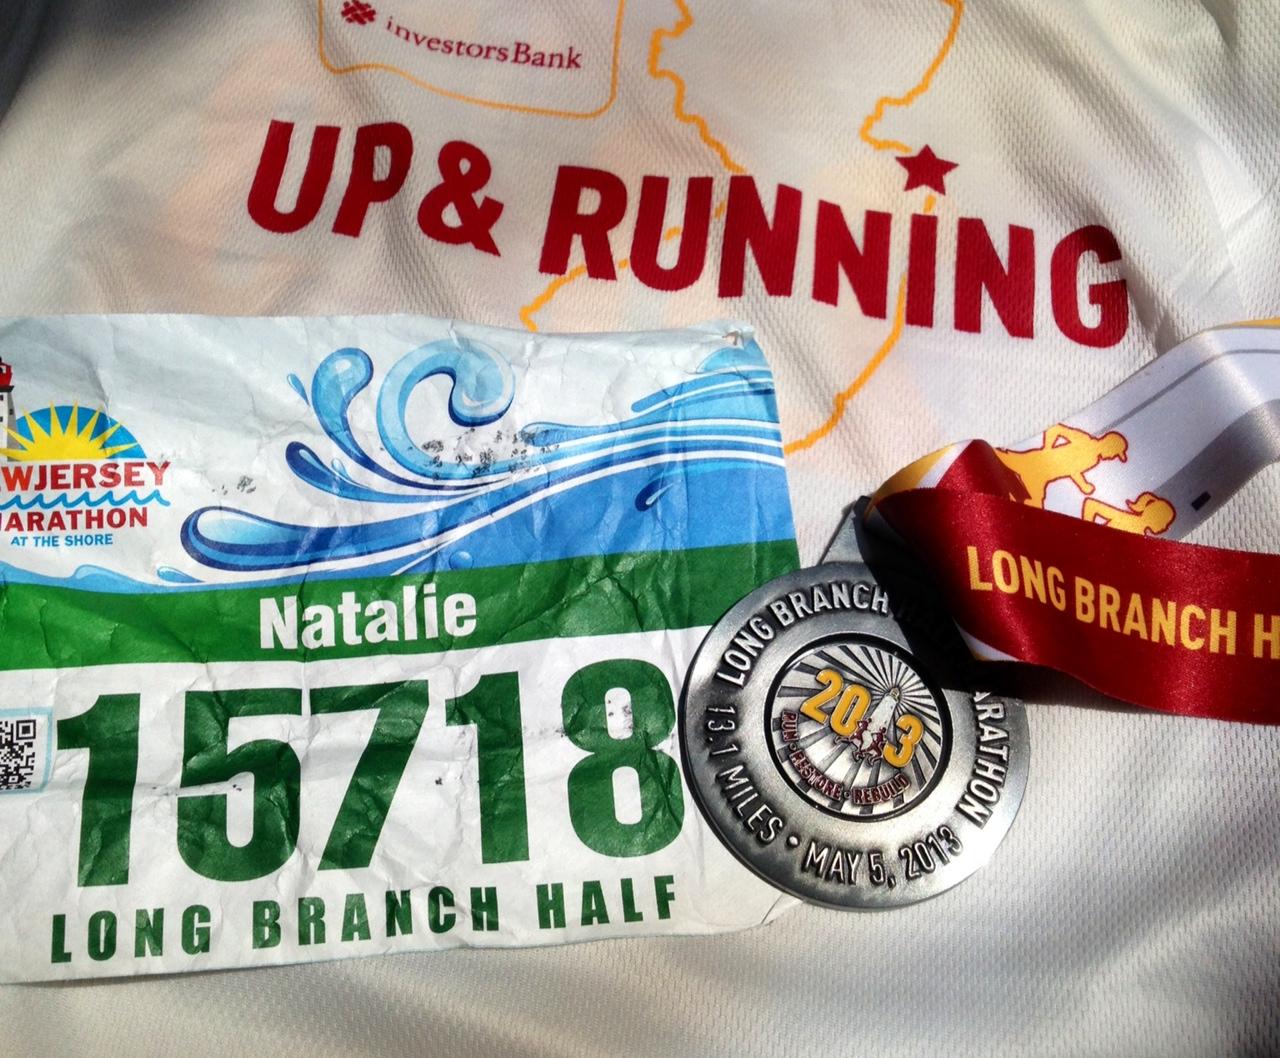 Long Branch Half Marathon, NJ Marathon, New Jersey Marathon, half marathon training, shore, stress fracture